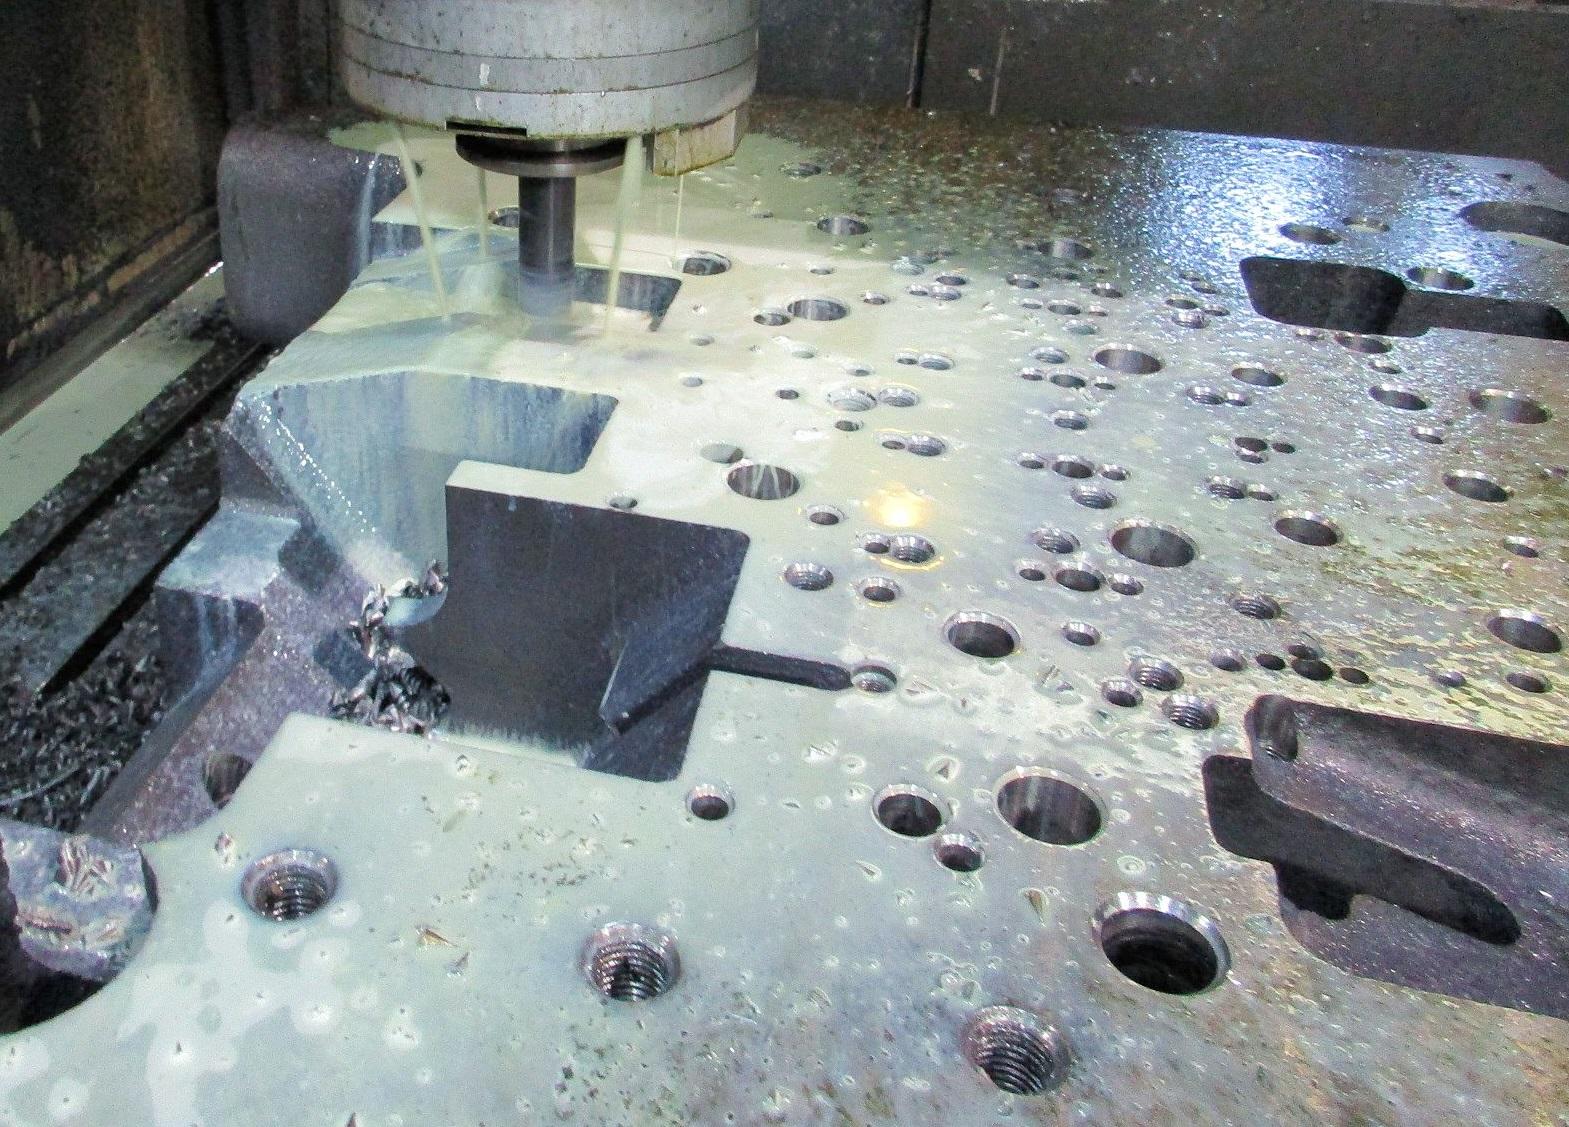 3rd製品別(7_ダイカスト金型)_中部門型マシニングセンターによる大型加工